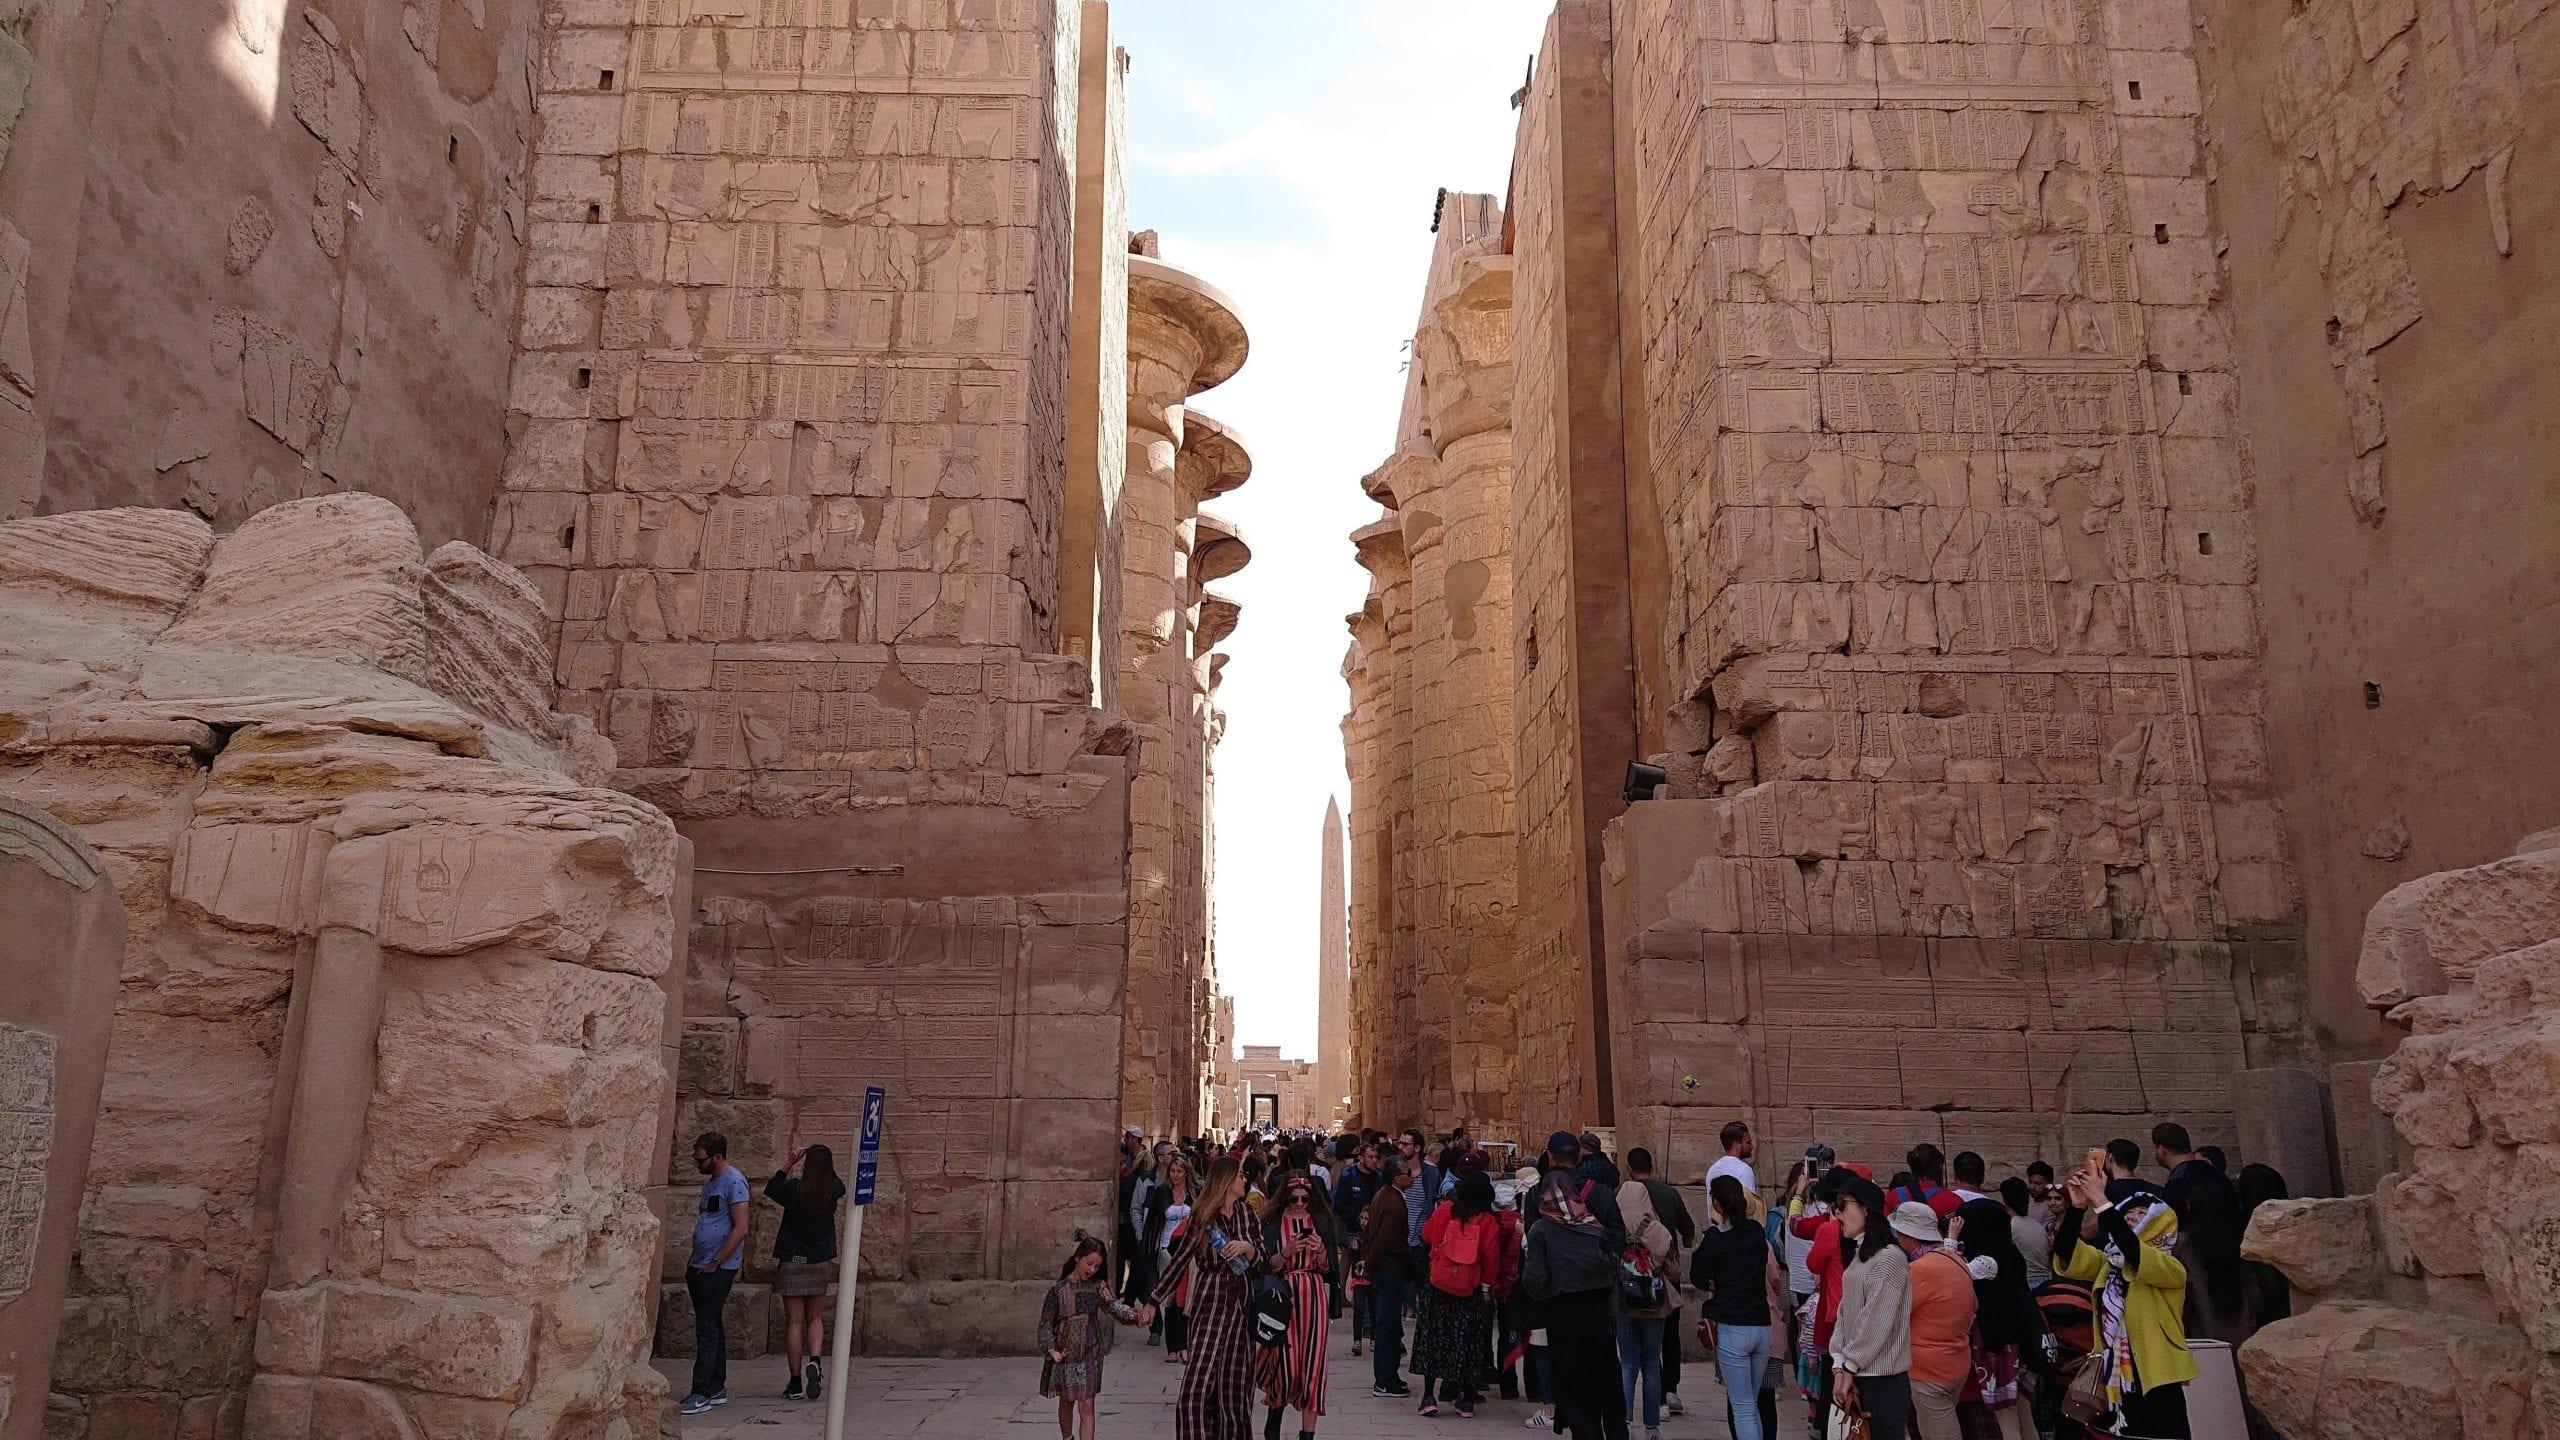 Temple of Karnak top things to see in Luxor